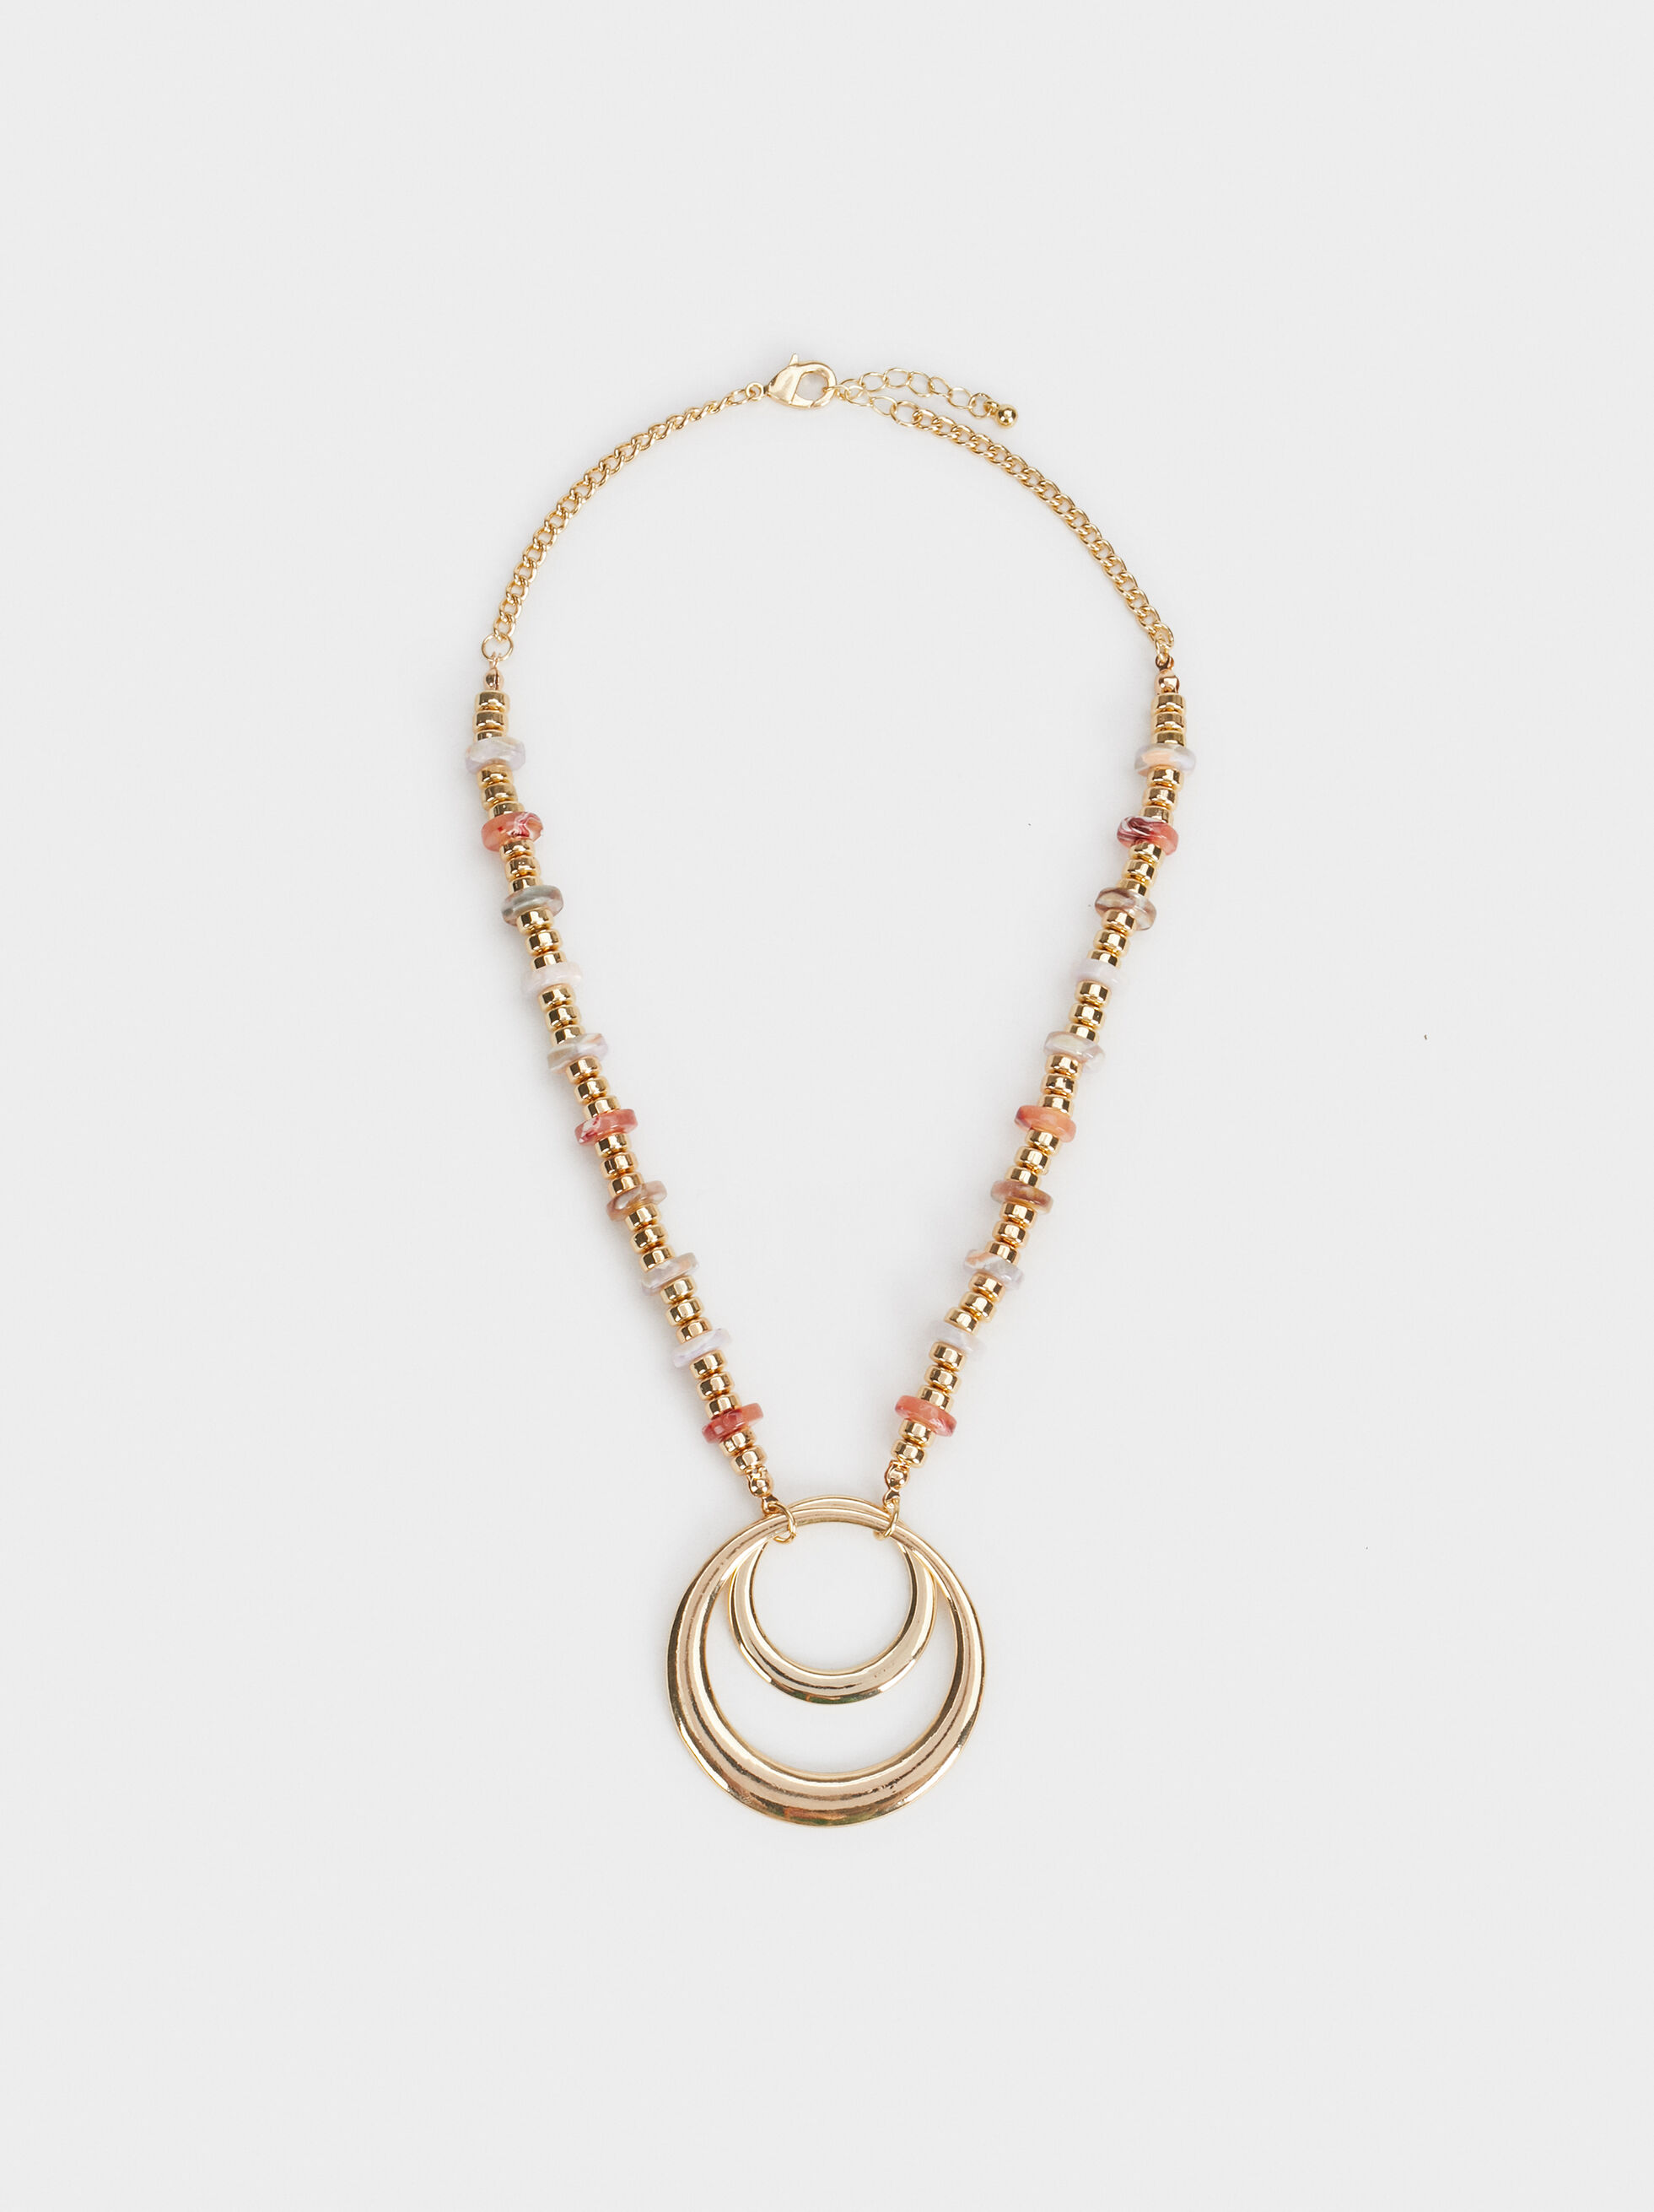 Land Short Necklace With Pendant, Multicolor, hi-res